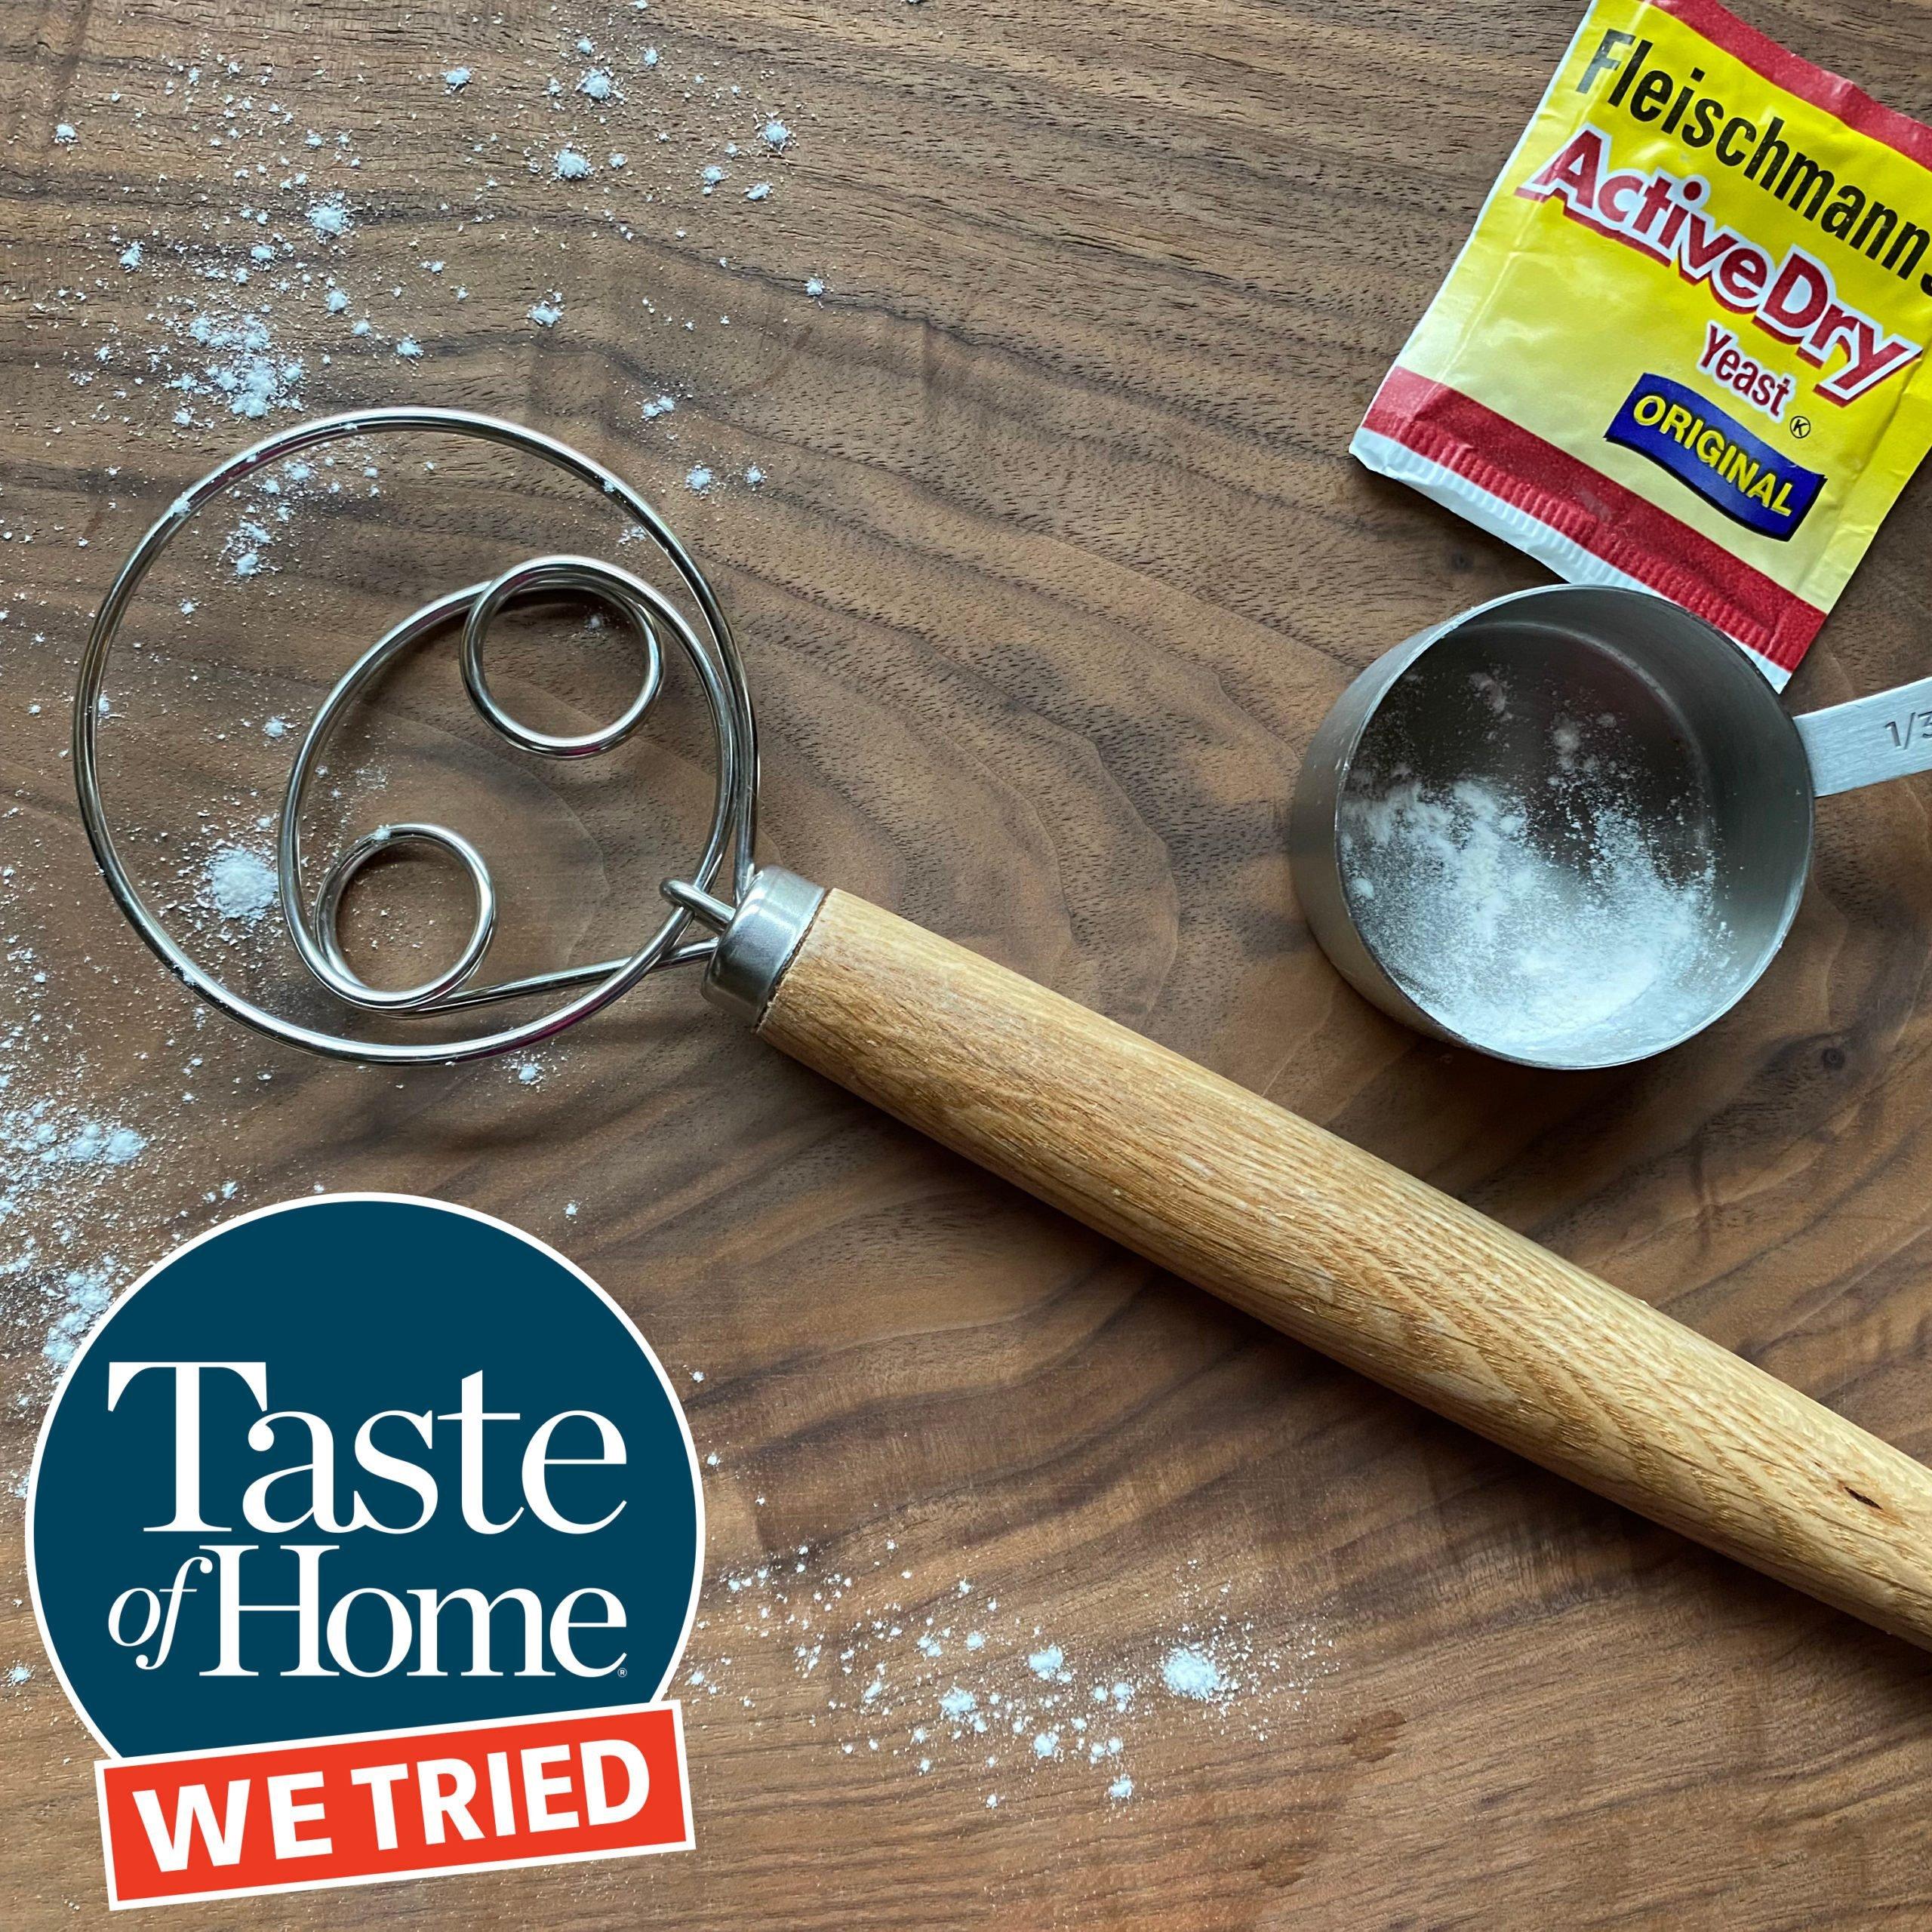 Dutch whisk-we tried